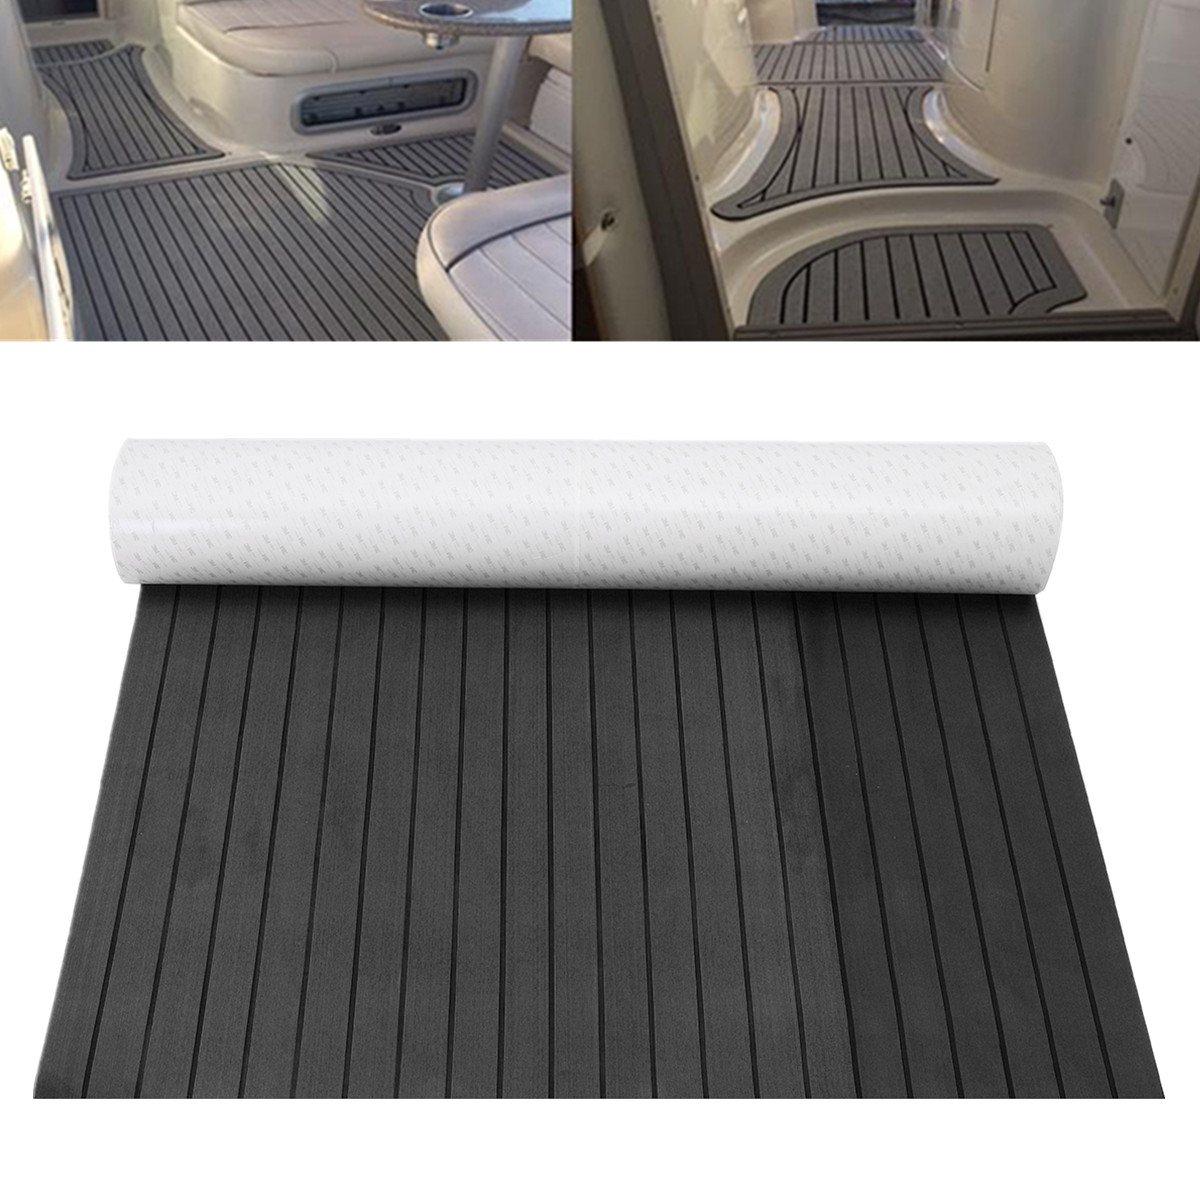 1200mmx2400mm EVA FOAM Mat Teak Sheet <font><b>Flooring</b></font> Decking Sheet RV Touring Car Marine Boat Dark Grey with Black Lines Mat